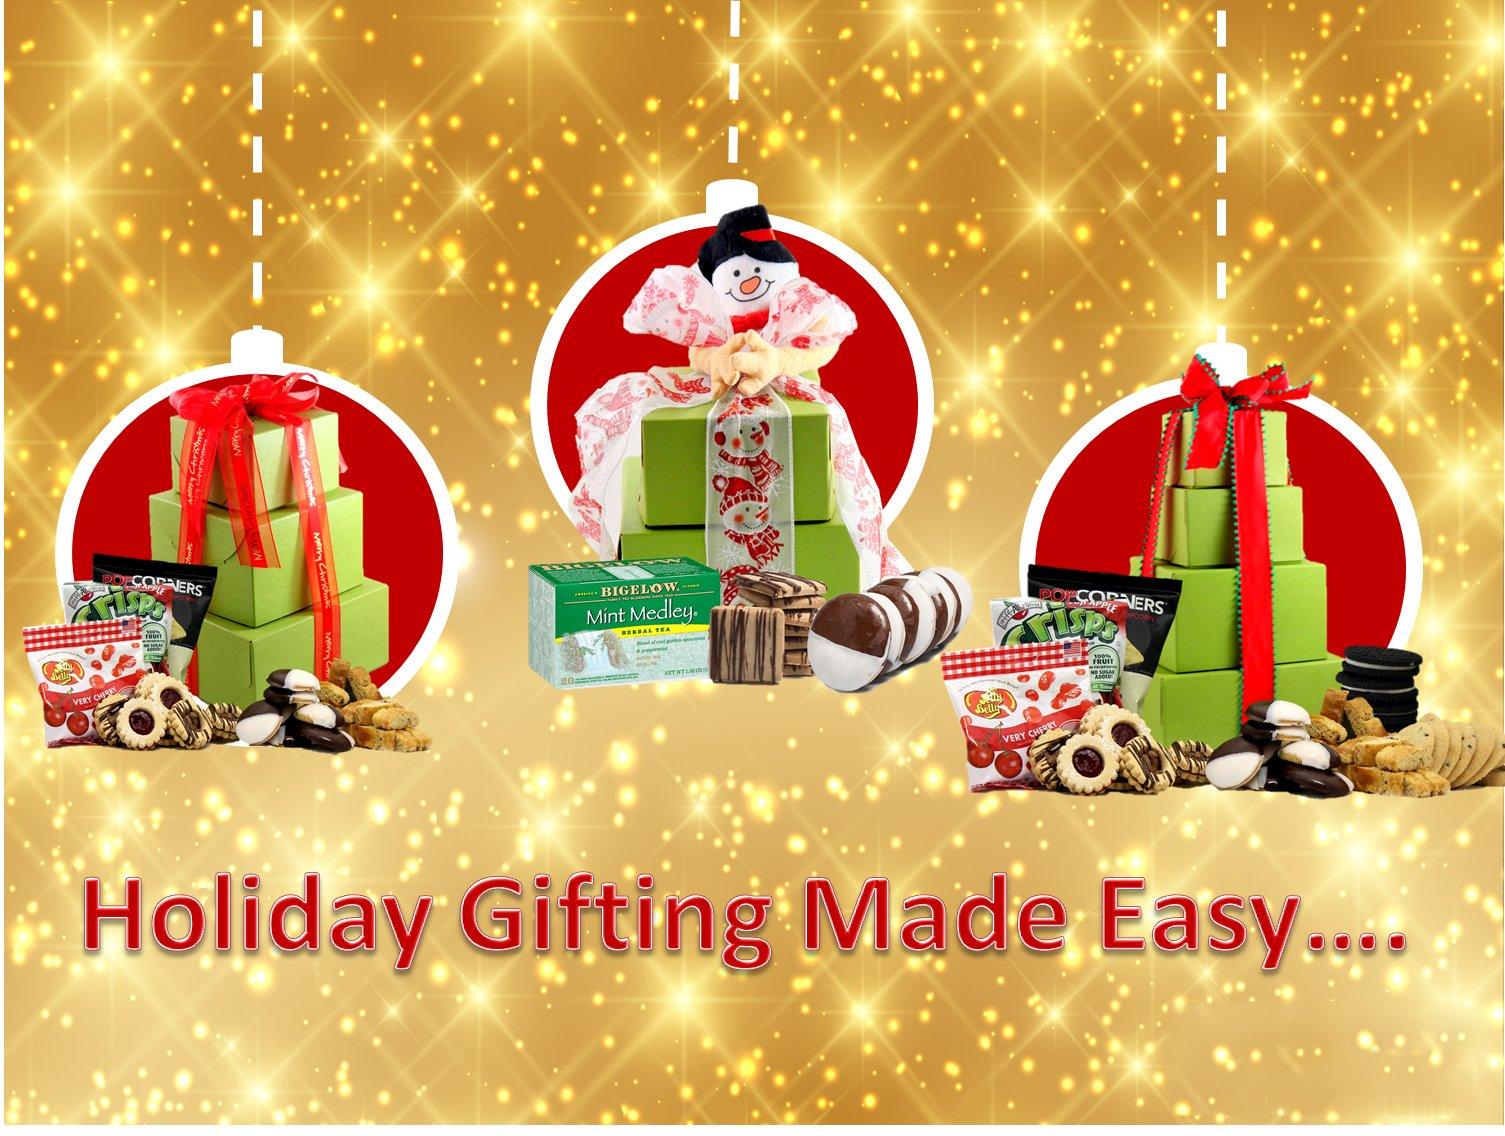 CDM product GlutenFreePalace.com Large-Palace Holiday-Delight-Gift Tower, Gourmet Holiday Gift Baskets, 2-Pound small thumbnail image